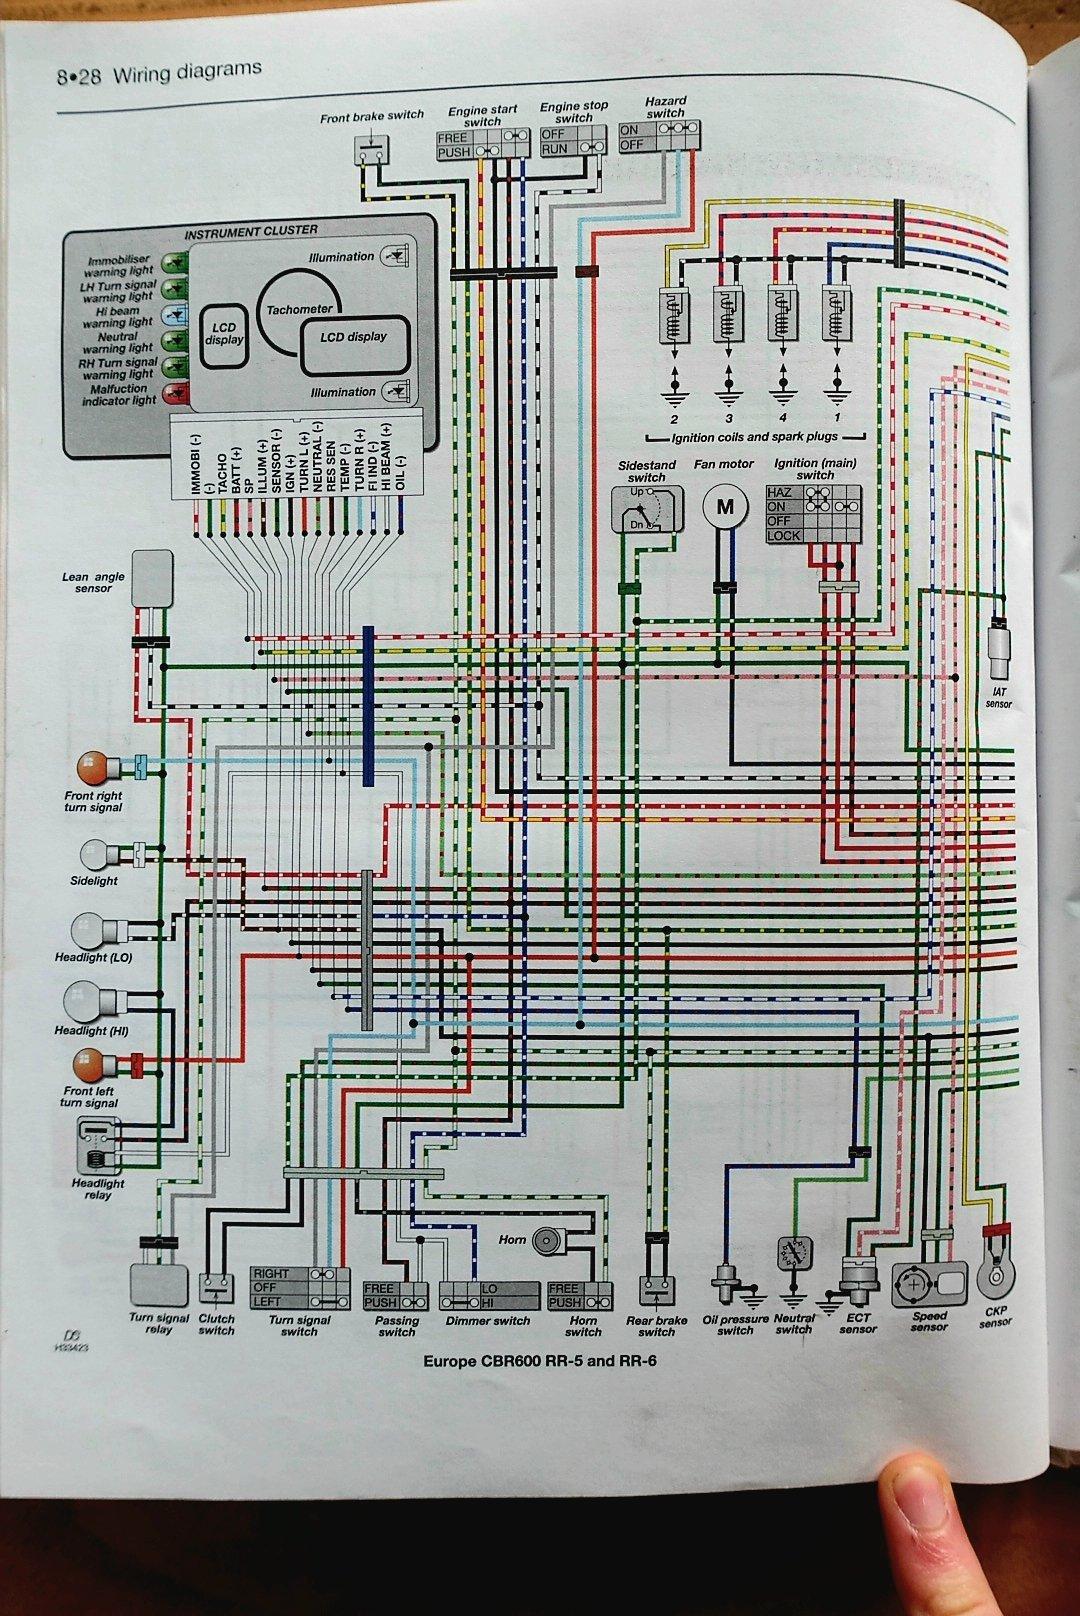 [SCHEMATICS_48IU]  Wiring help please - Domino start/kill switch | Honda CBR 600RR Forum | Honda 600rr Wiring Diagram |  | 600RR.net